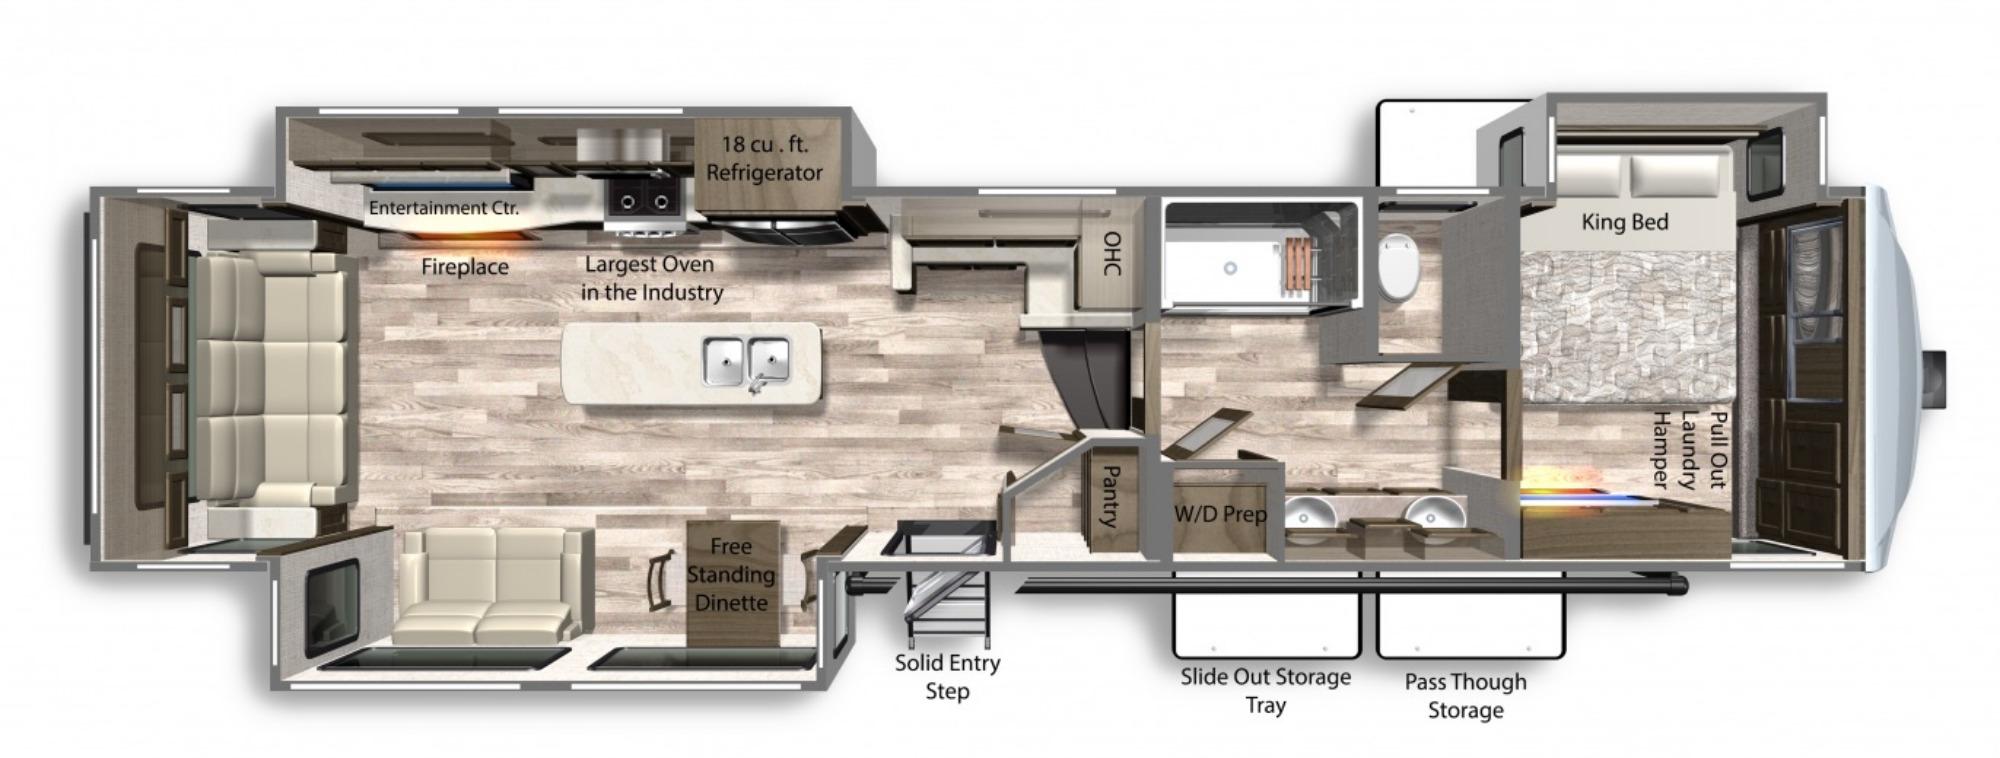 View Floor Plan for 2021 DUTCHMEN YUKON 400RL